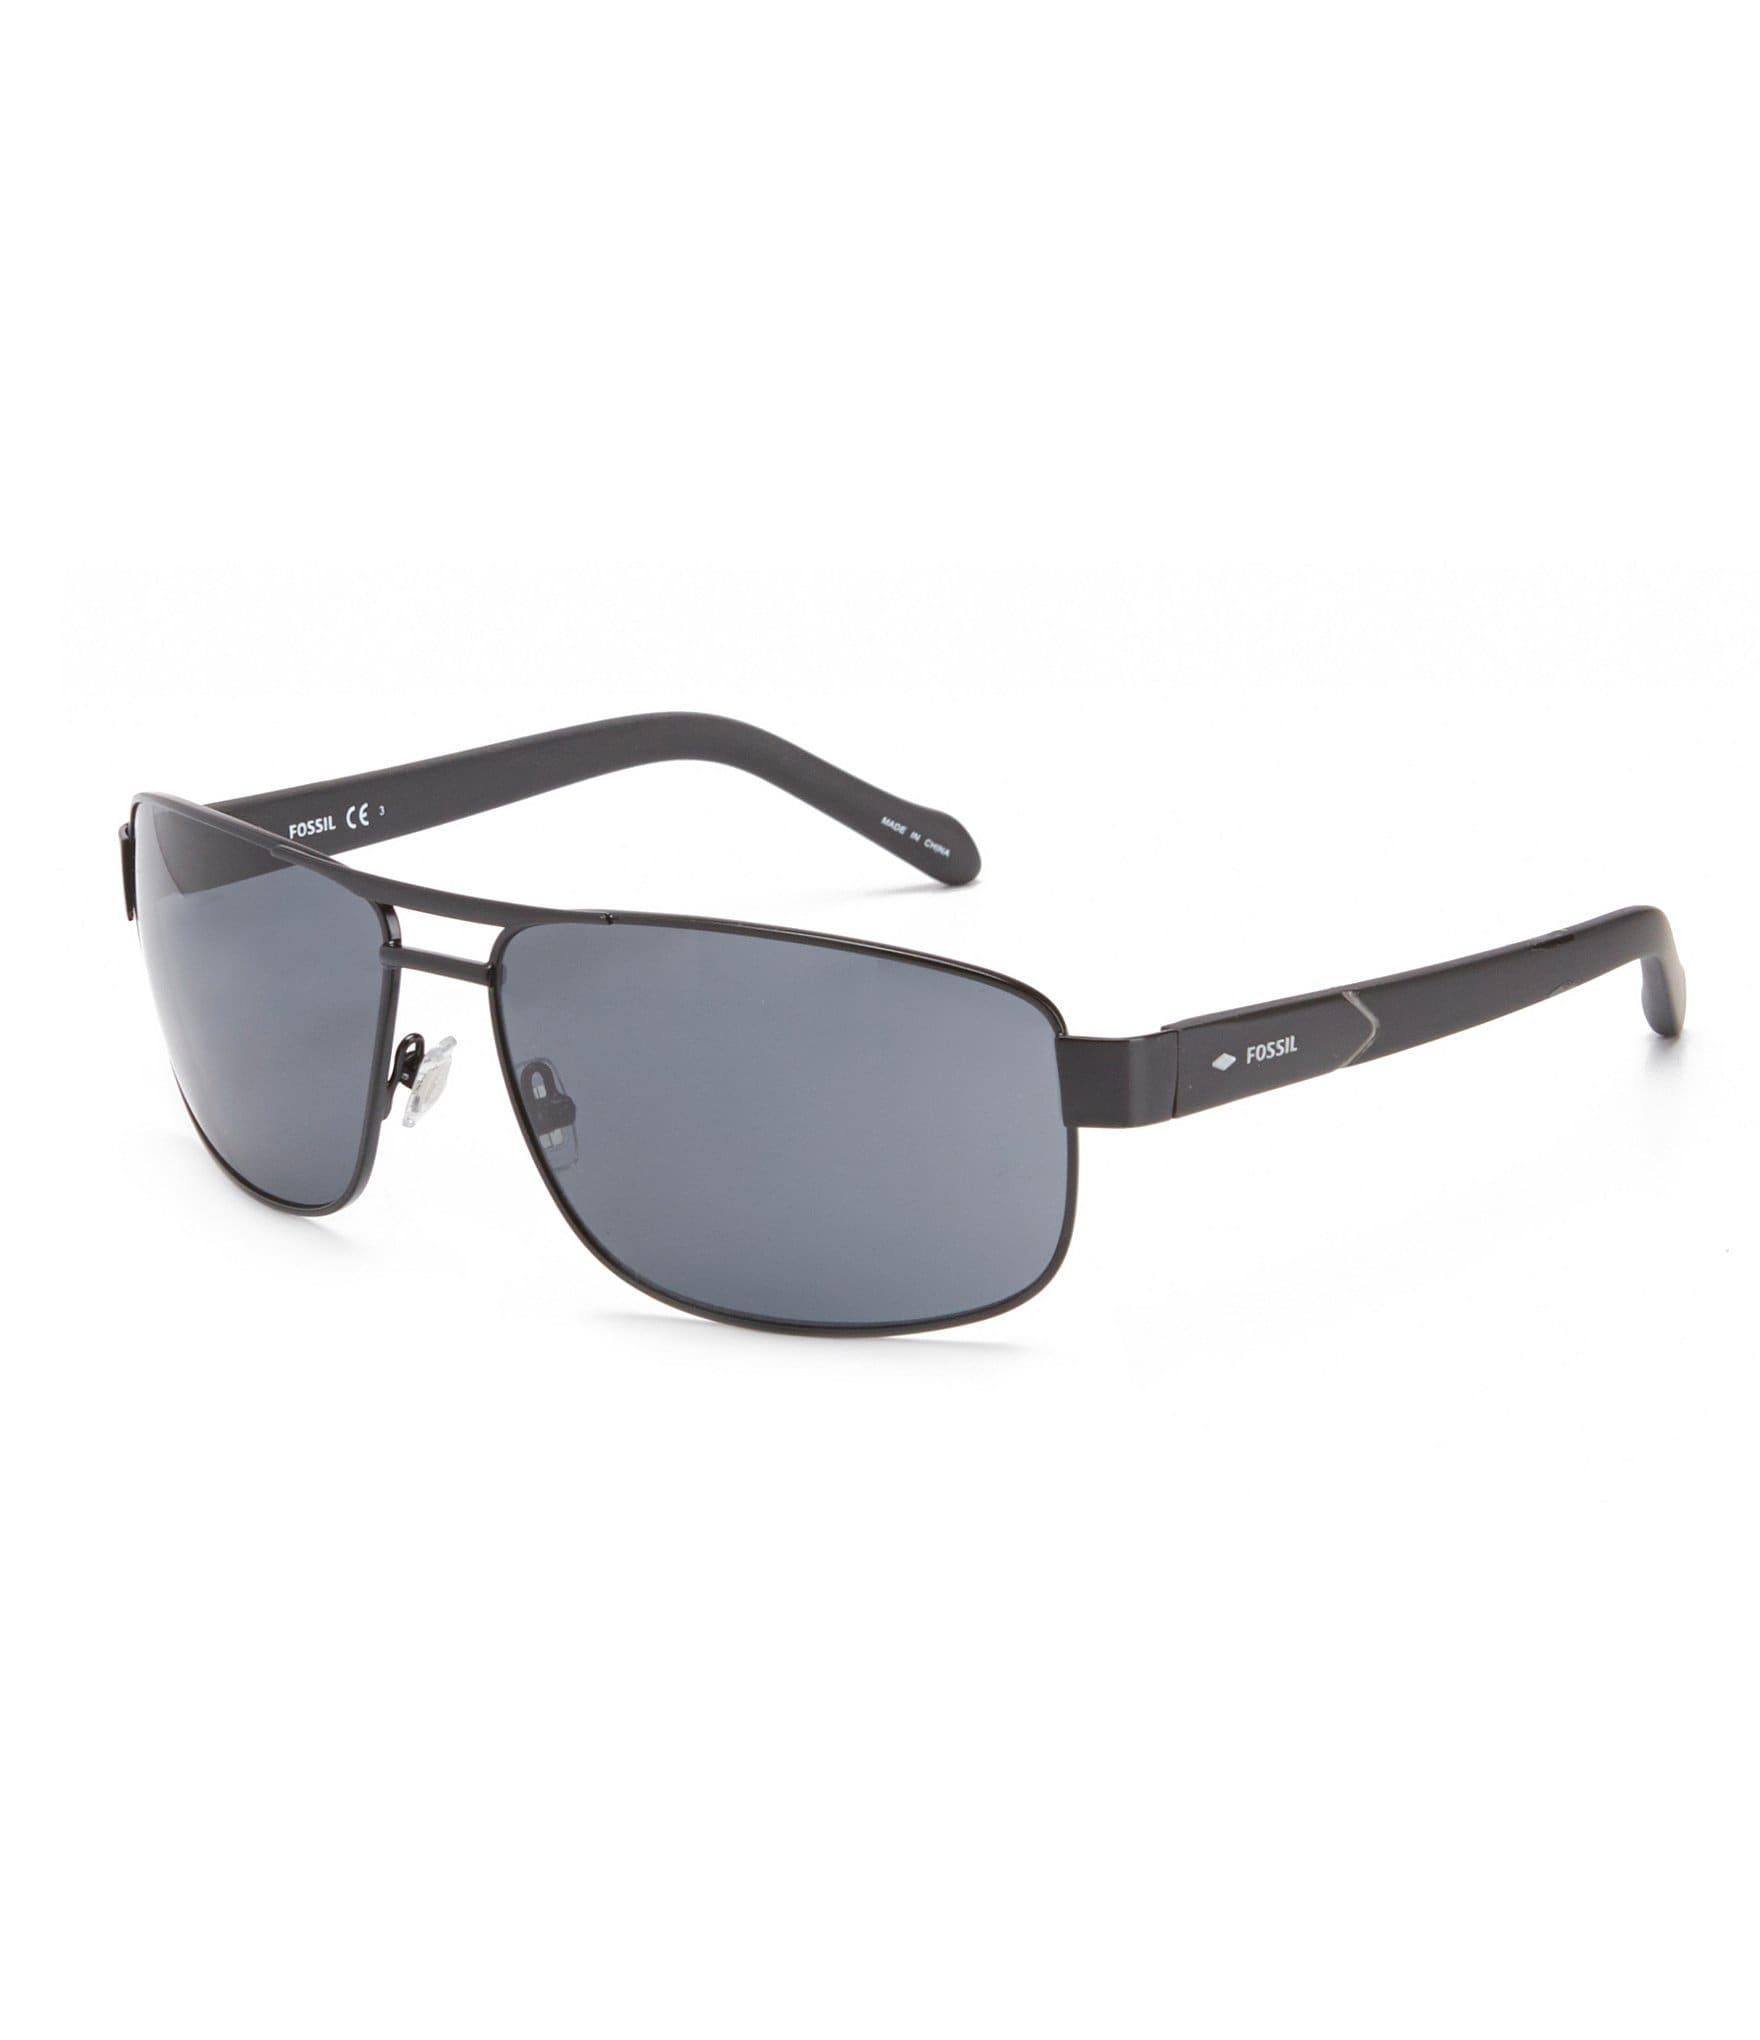 a3555200691 Fossil Sunglasses   Eyewear